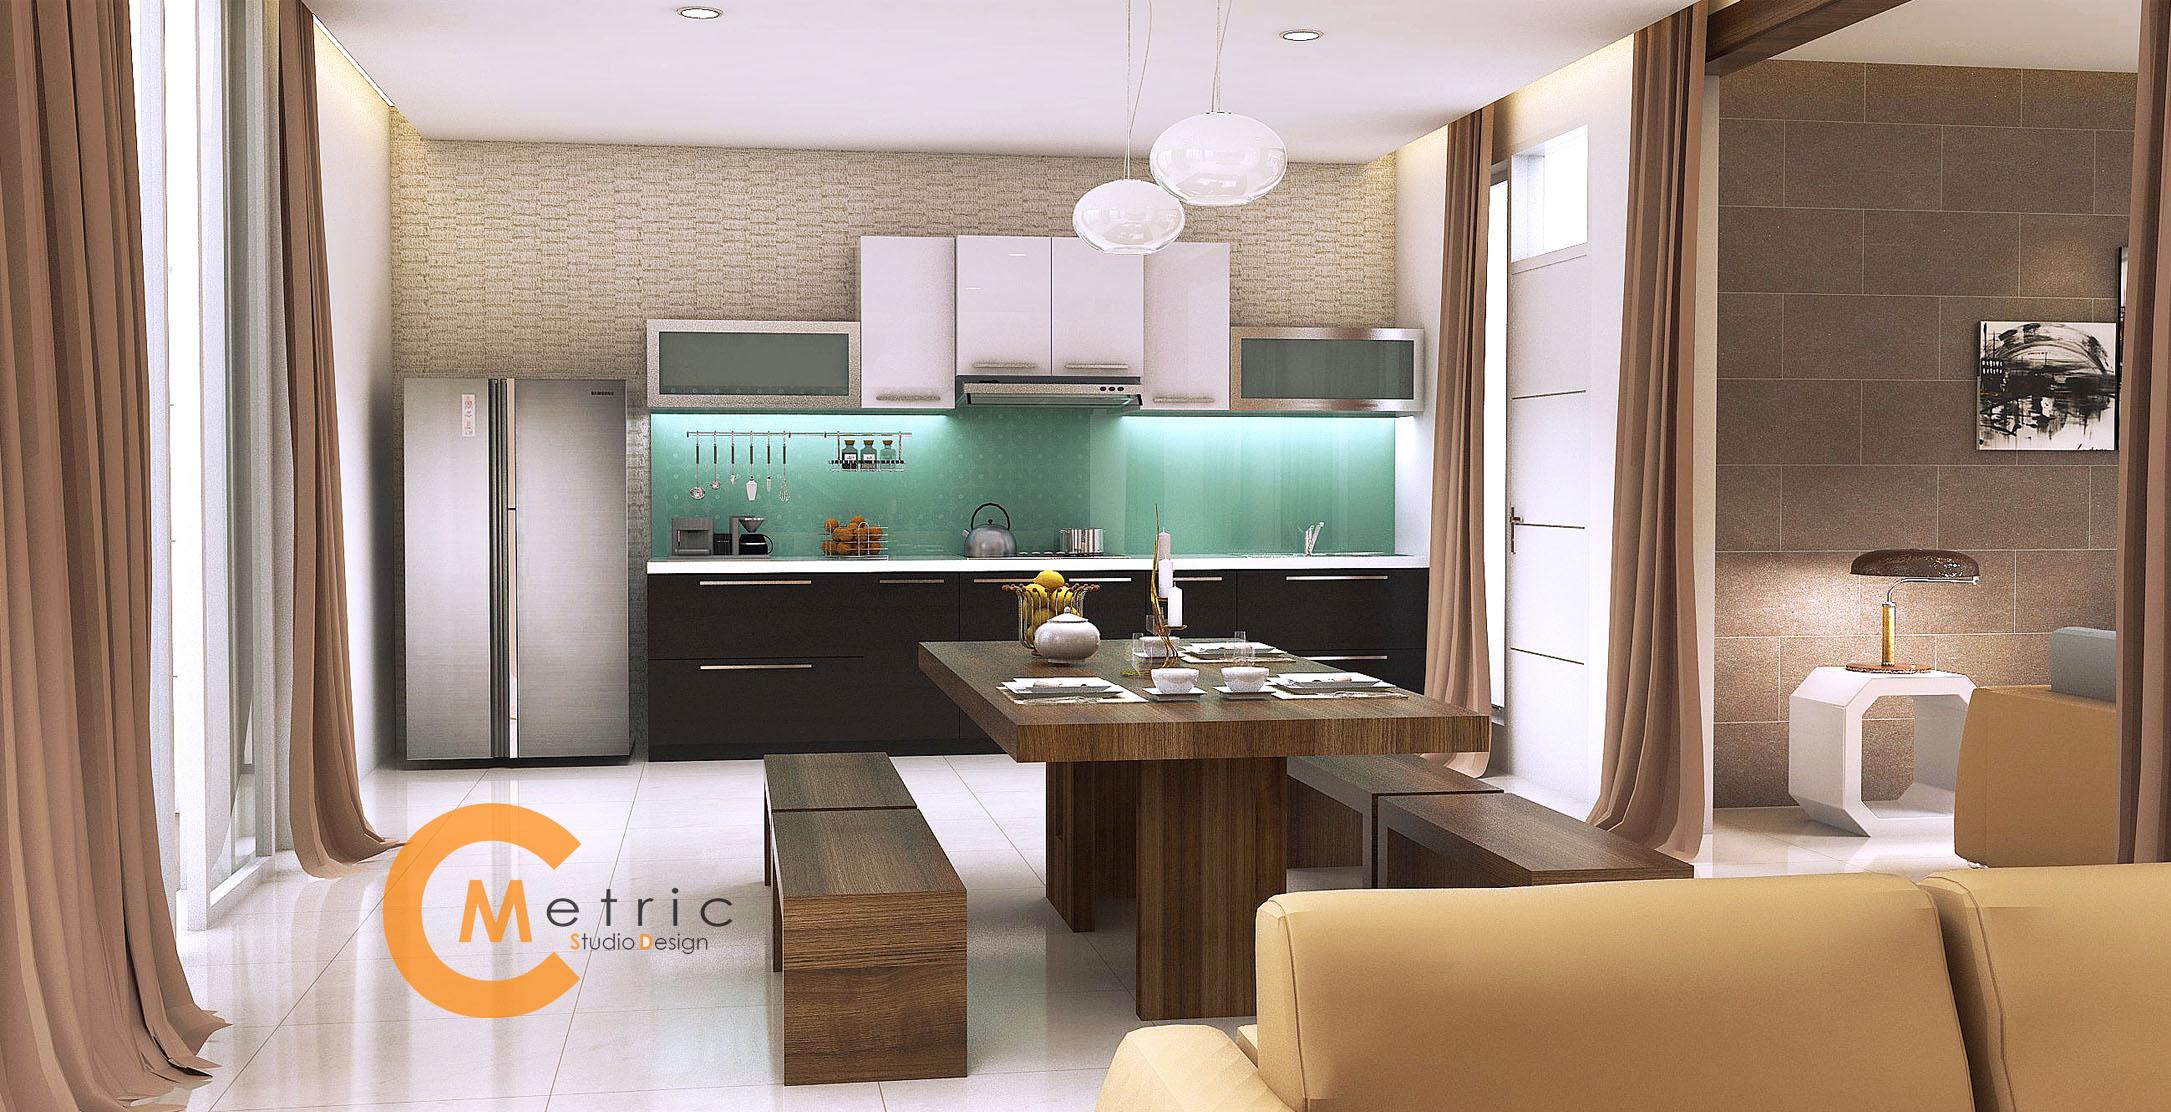 jasa 3d model interior furniture desain gambar arsitekture apartemen kitchen set mebel